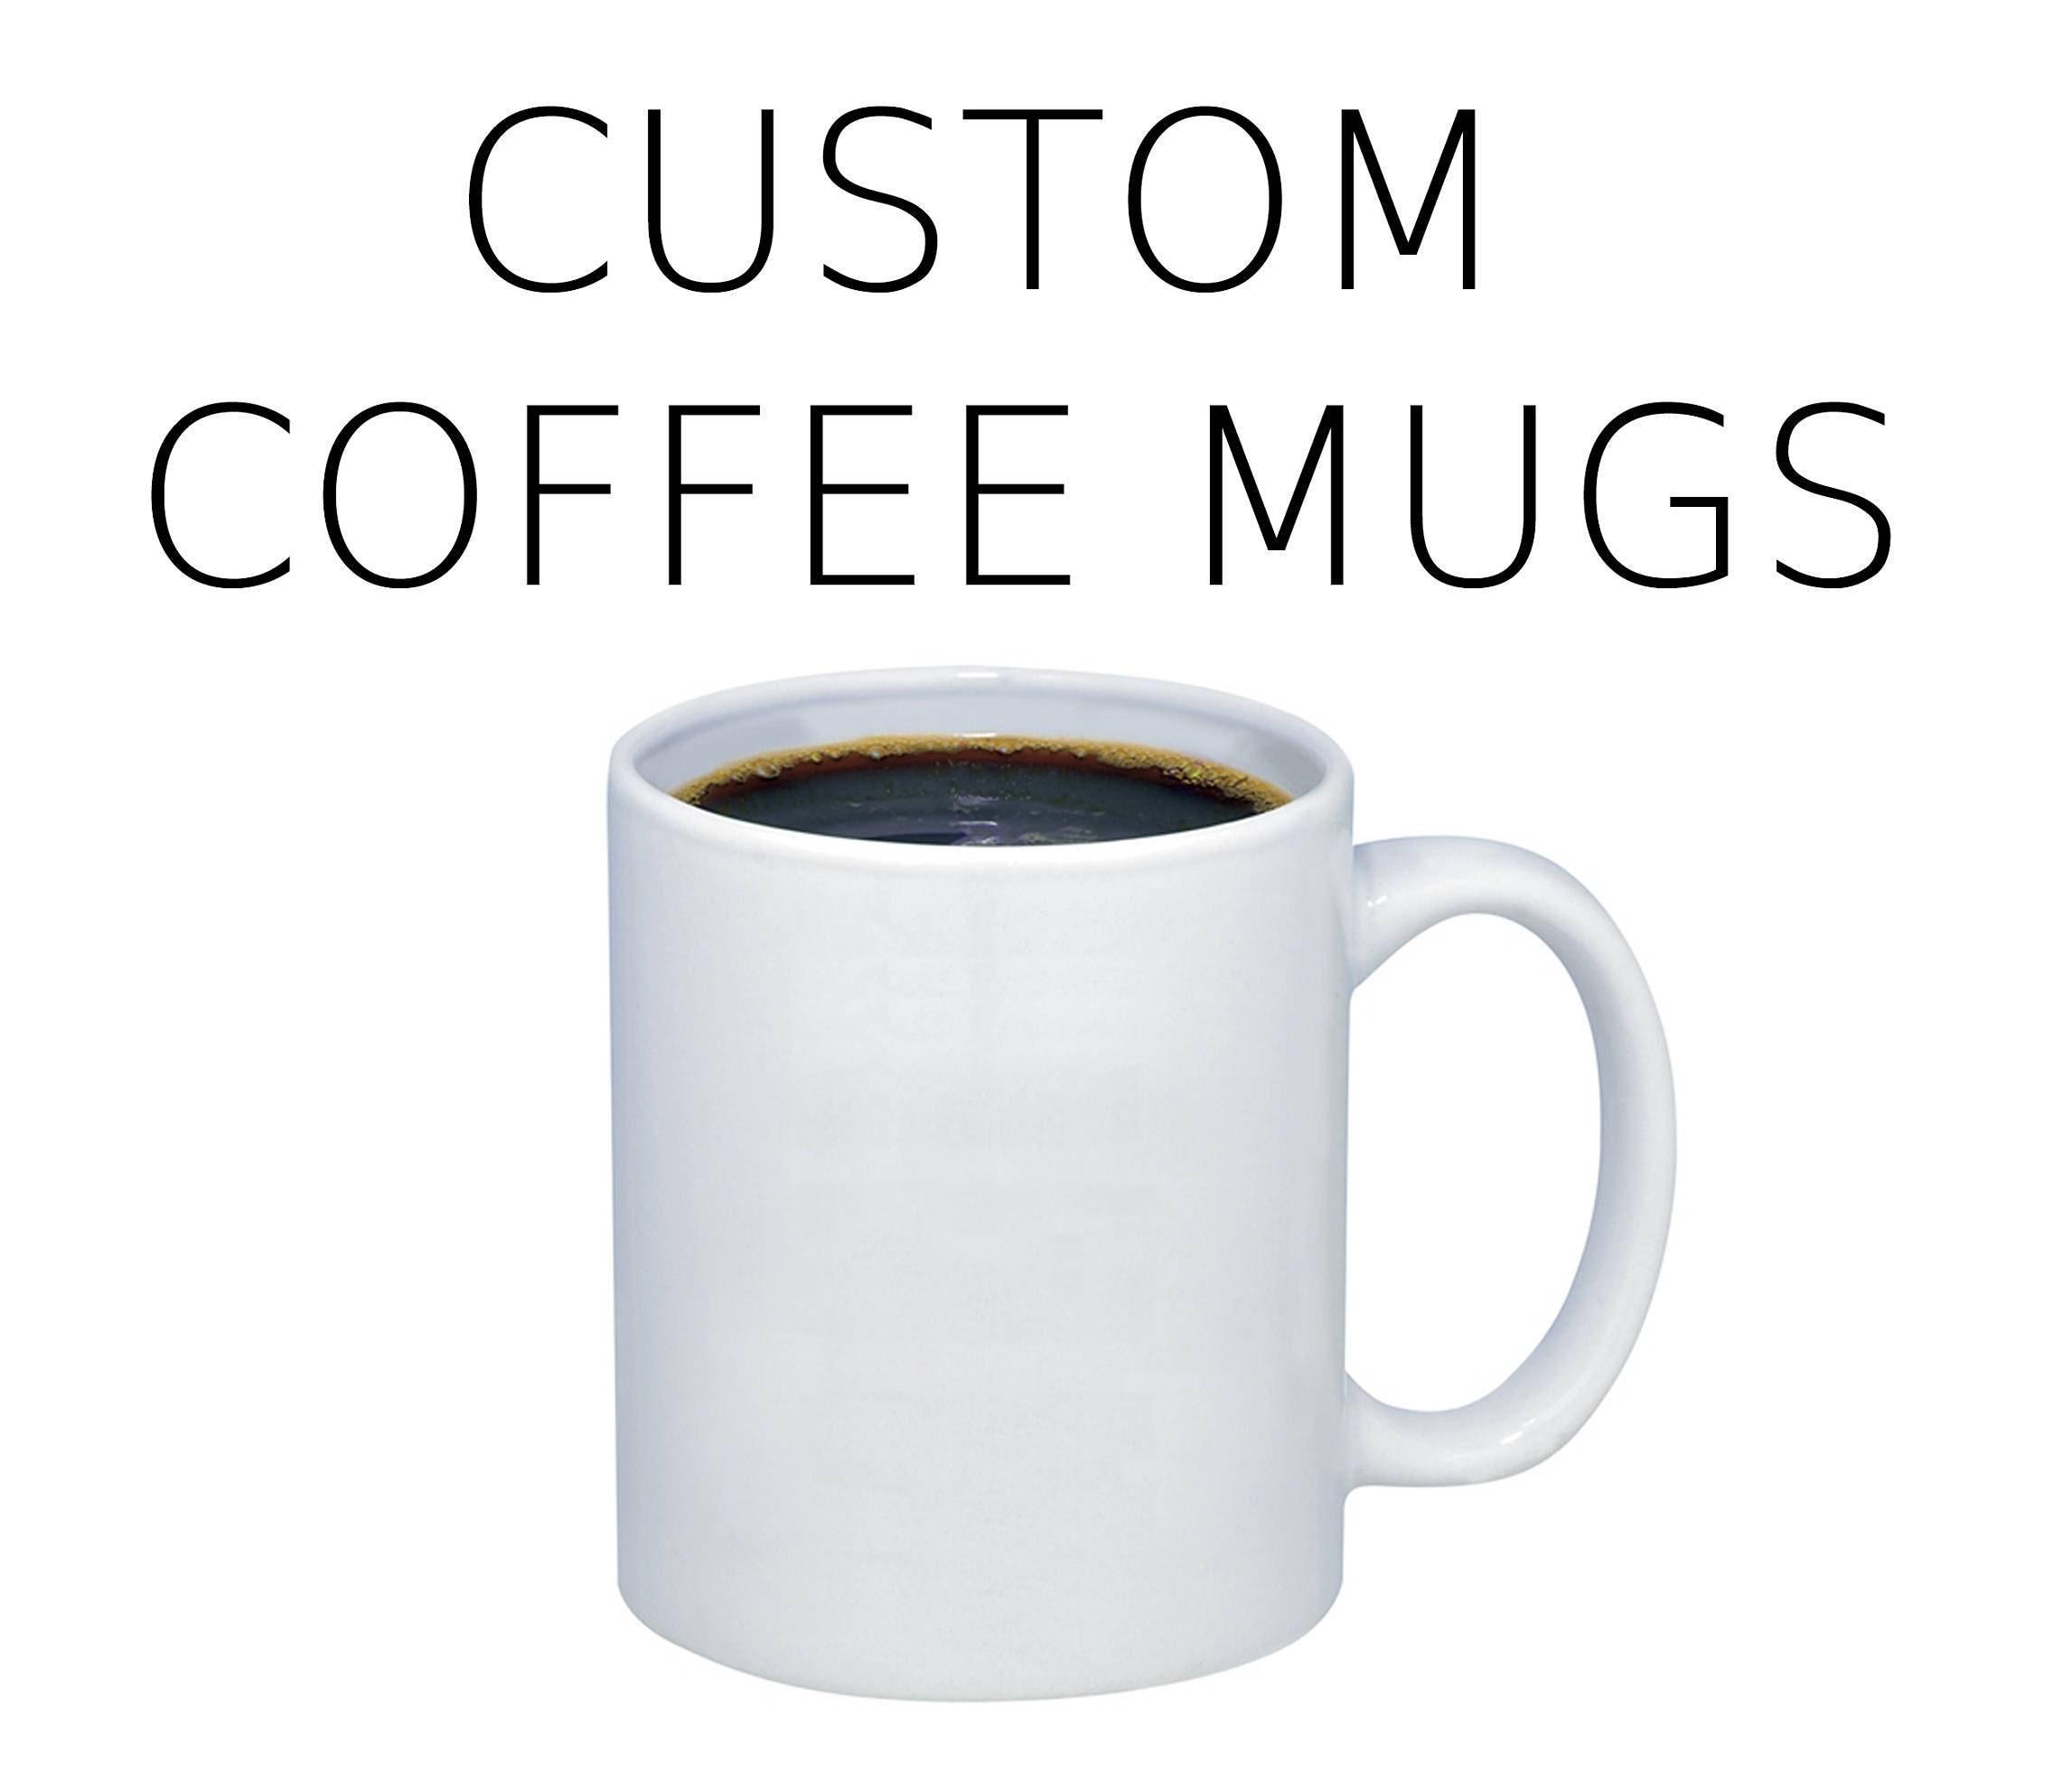 Personalized Coffee Mugs. Custom Work. Your favorite ...